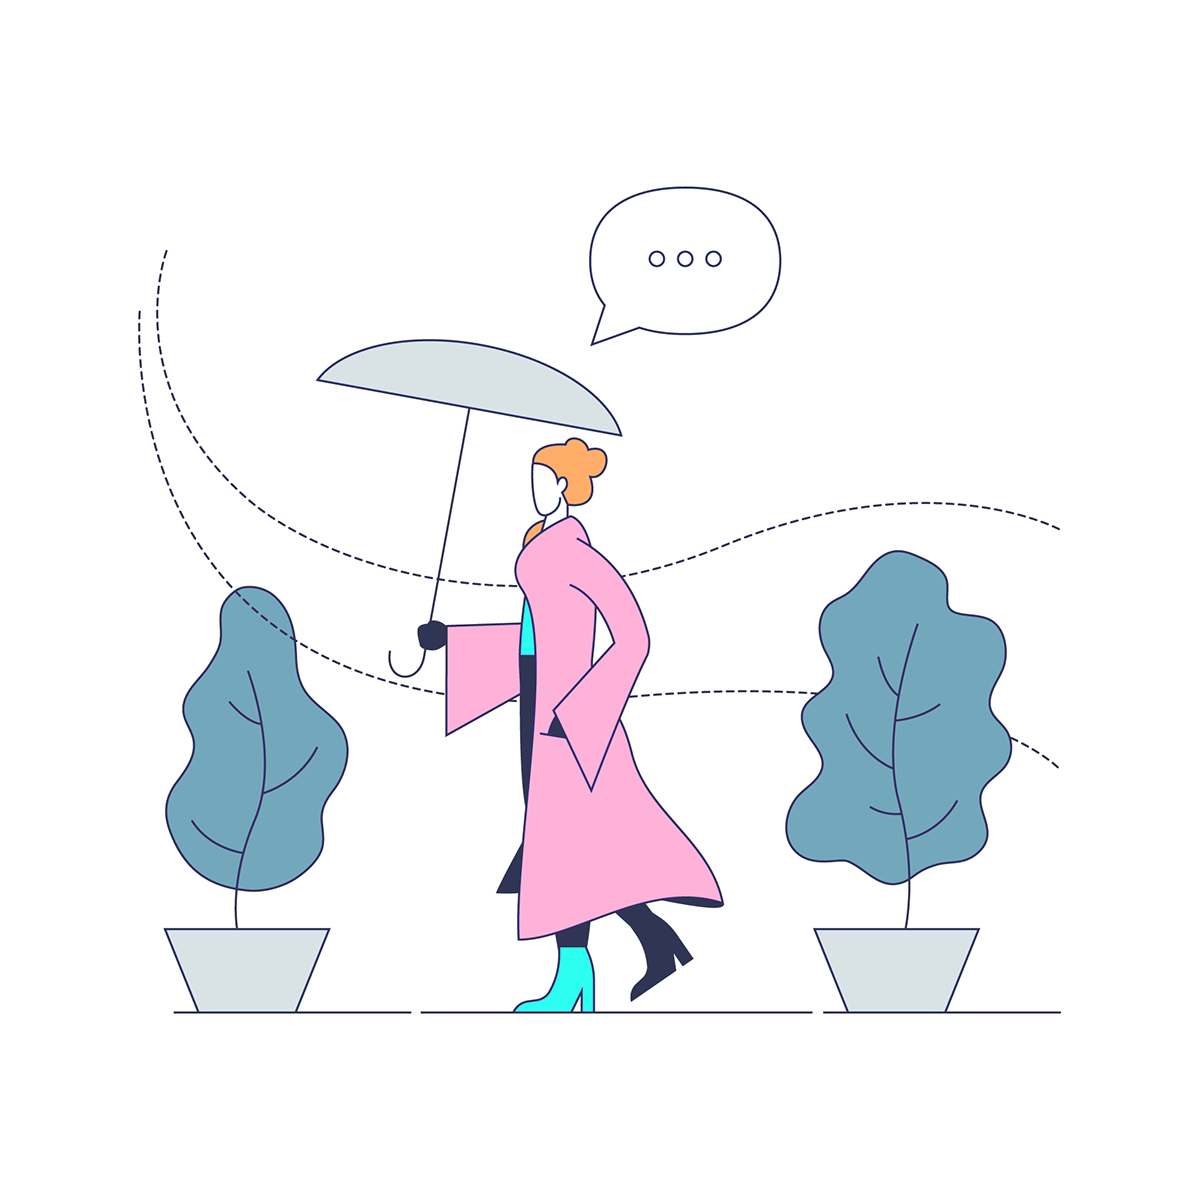 character illustration digital illustration ILLUSTRATION  illustration set